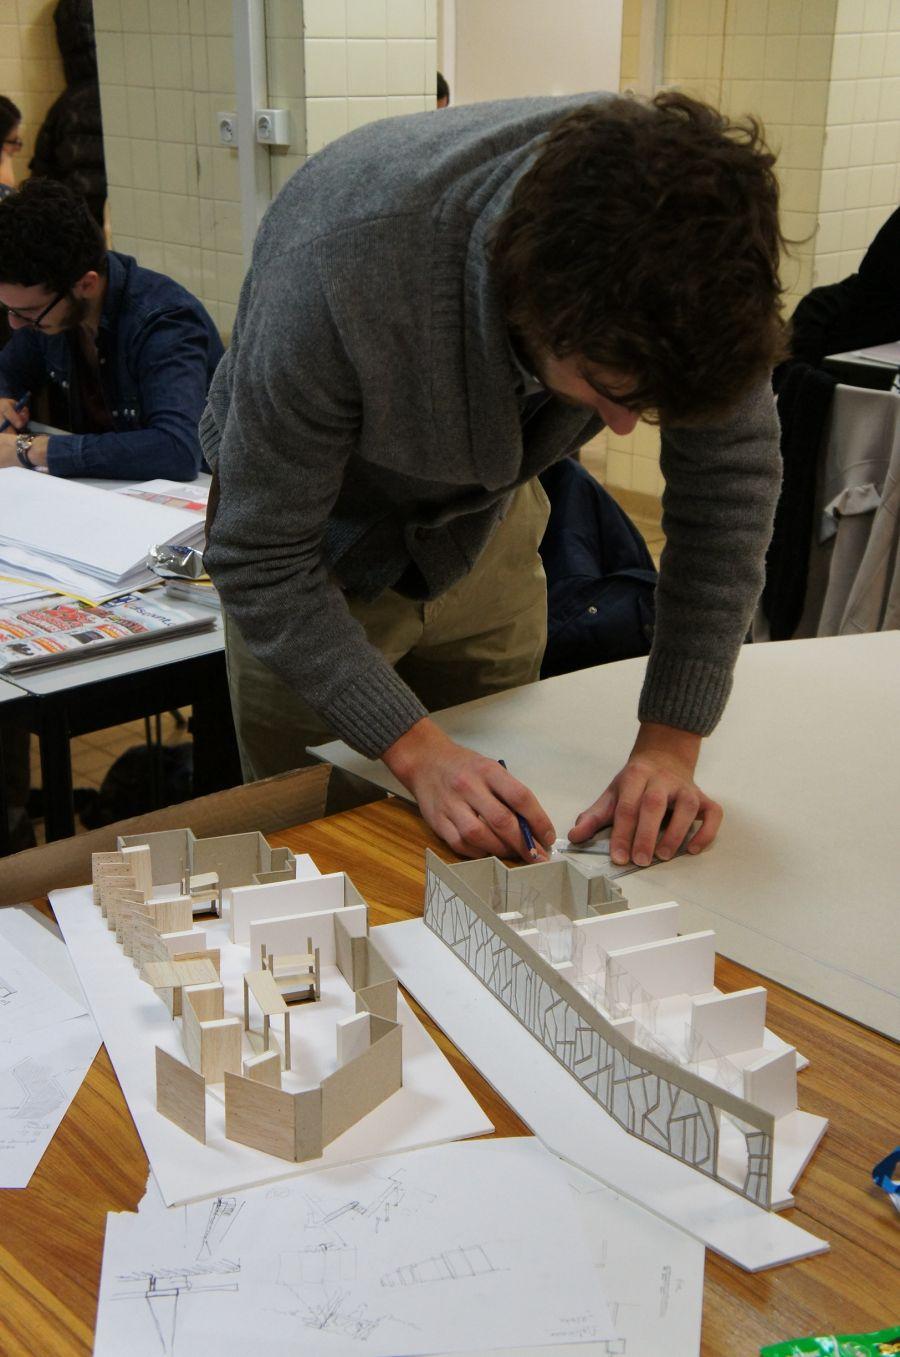 Bts design d espace : la 3D